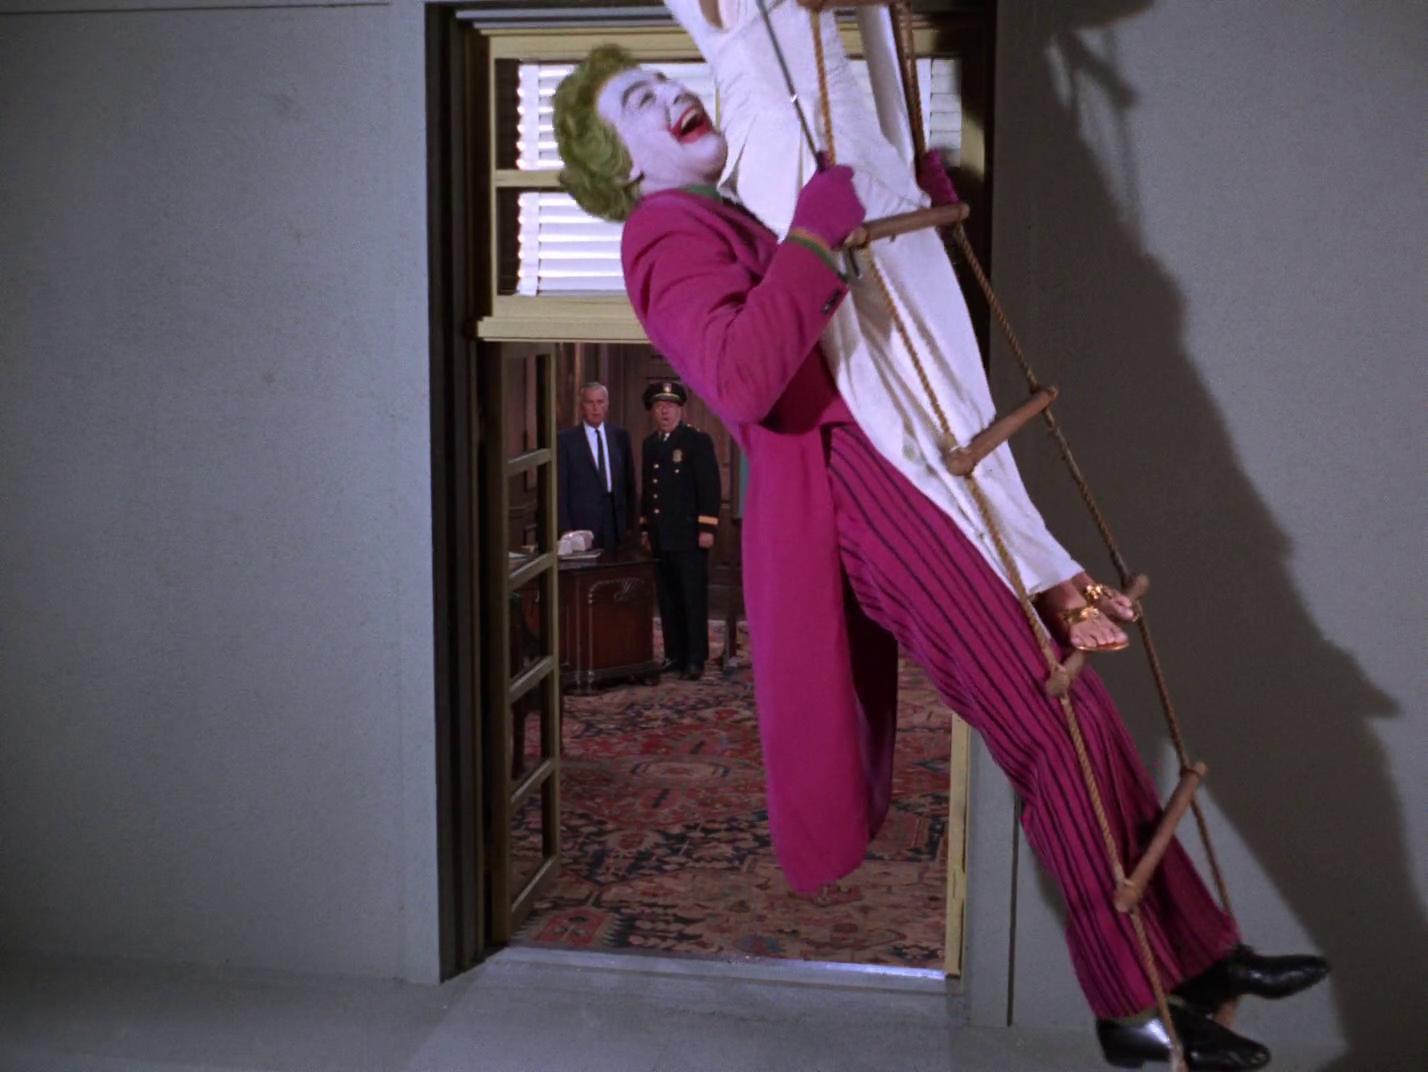 Batman The Zodiac Crimes  ,Episode aired 11 January 1967 Season 2 | Episode 37, Cesar Romero... The Joker